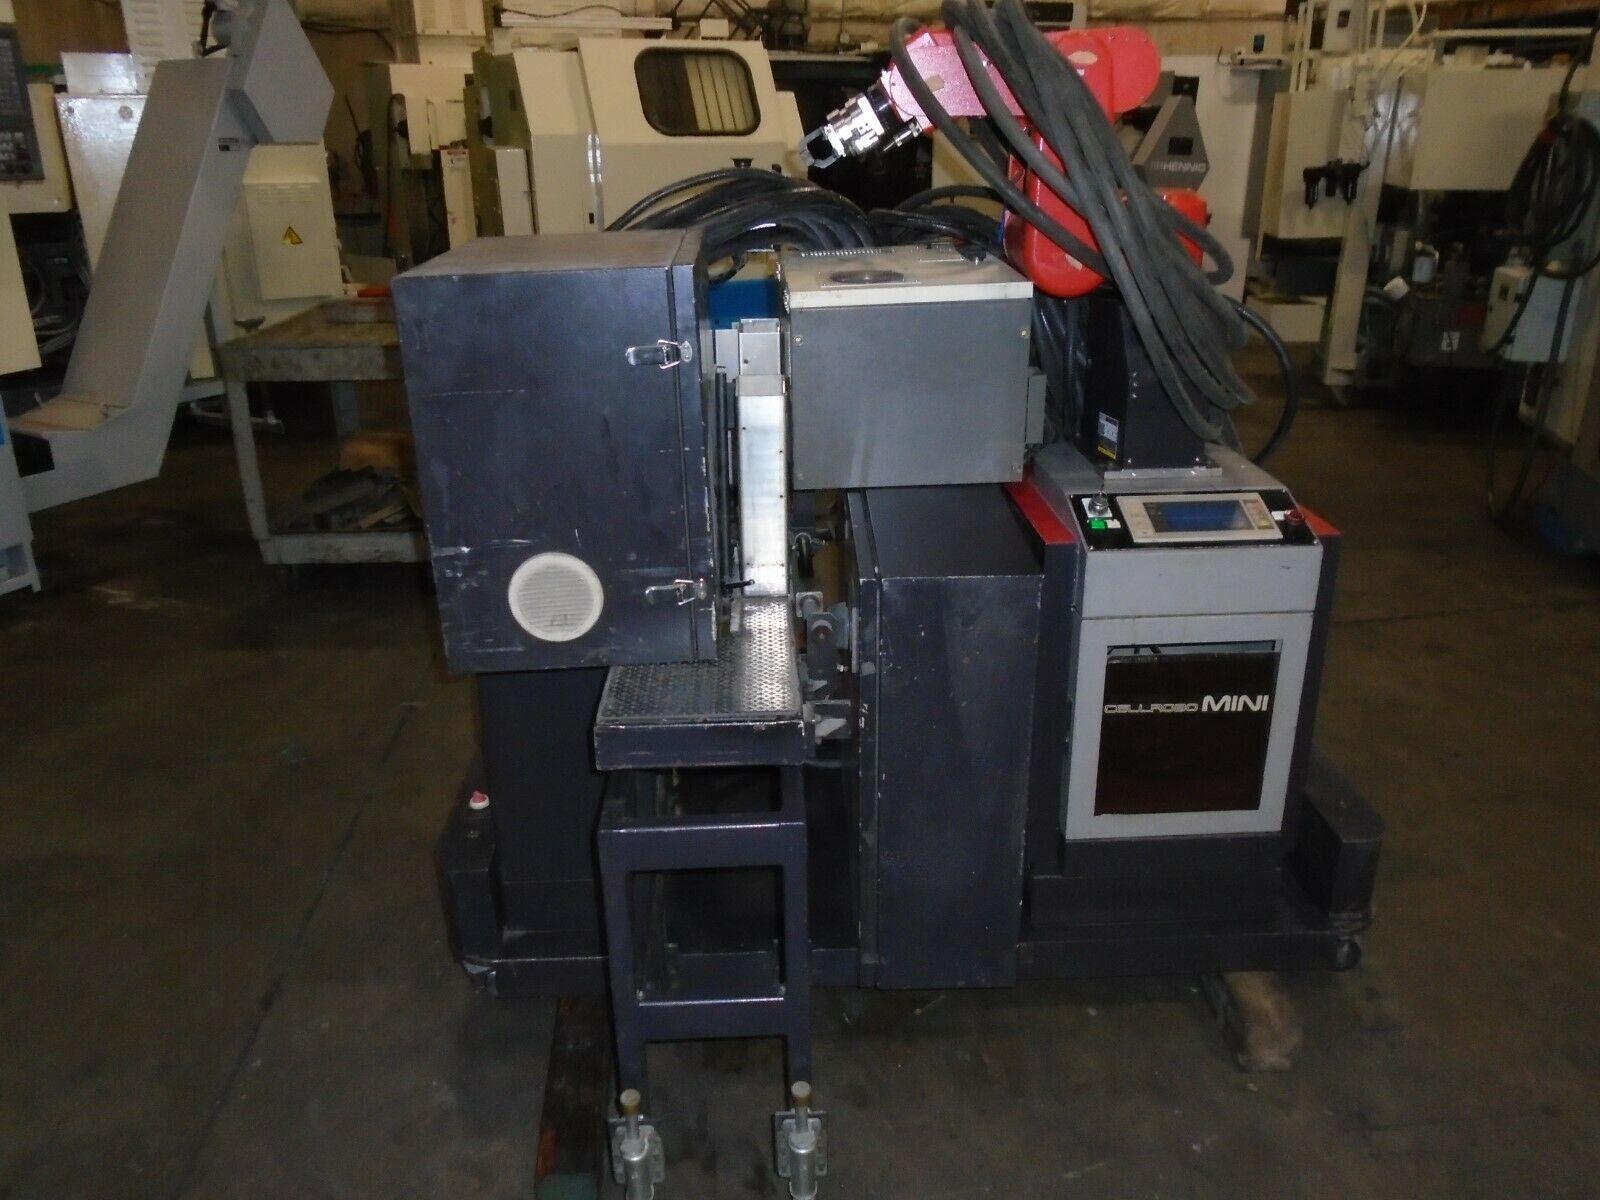 Fanuc Robot LR Mate 100 A5B-1131-8001 Mini Cel R-J2 Control - Image 11 of 12